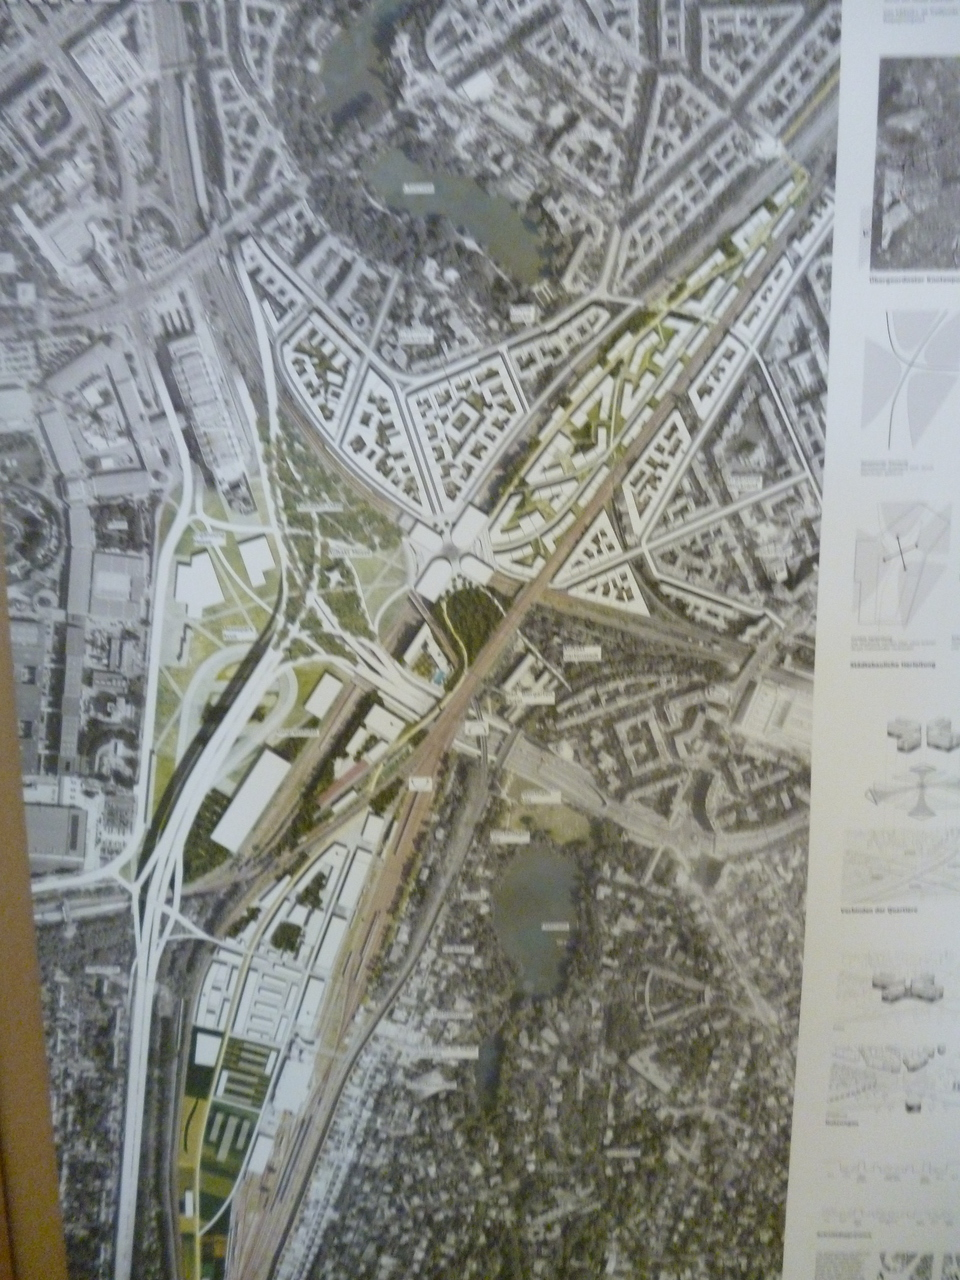 westkreuz-planungen9eb4n.jpg